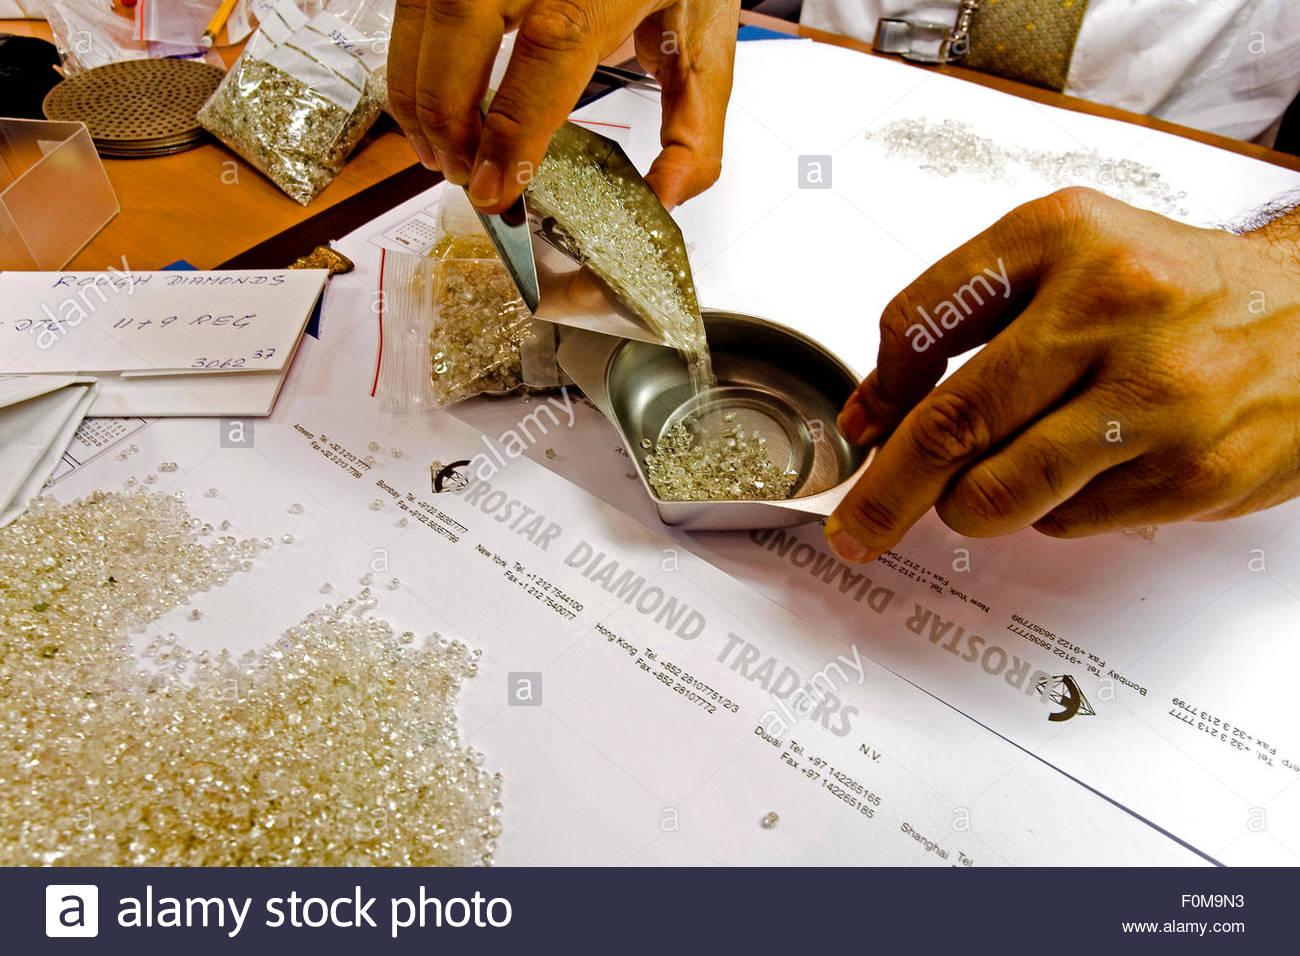 Rough diamonds, Eurostar Diamond Traders company owned by Kaushik Mehta, Indian Bombay businessman, Antwerp - Stock Image